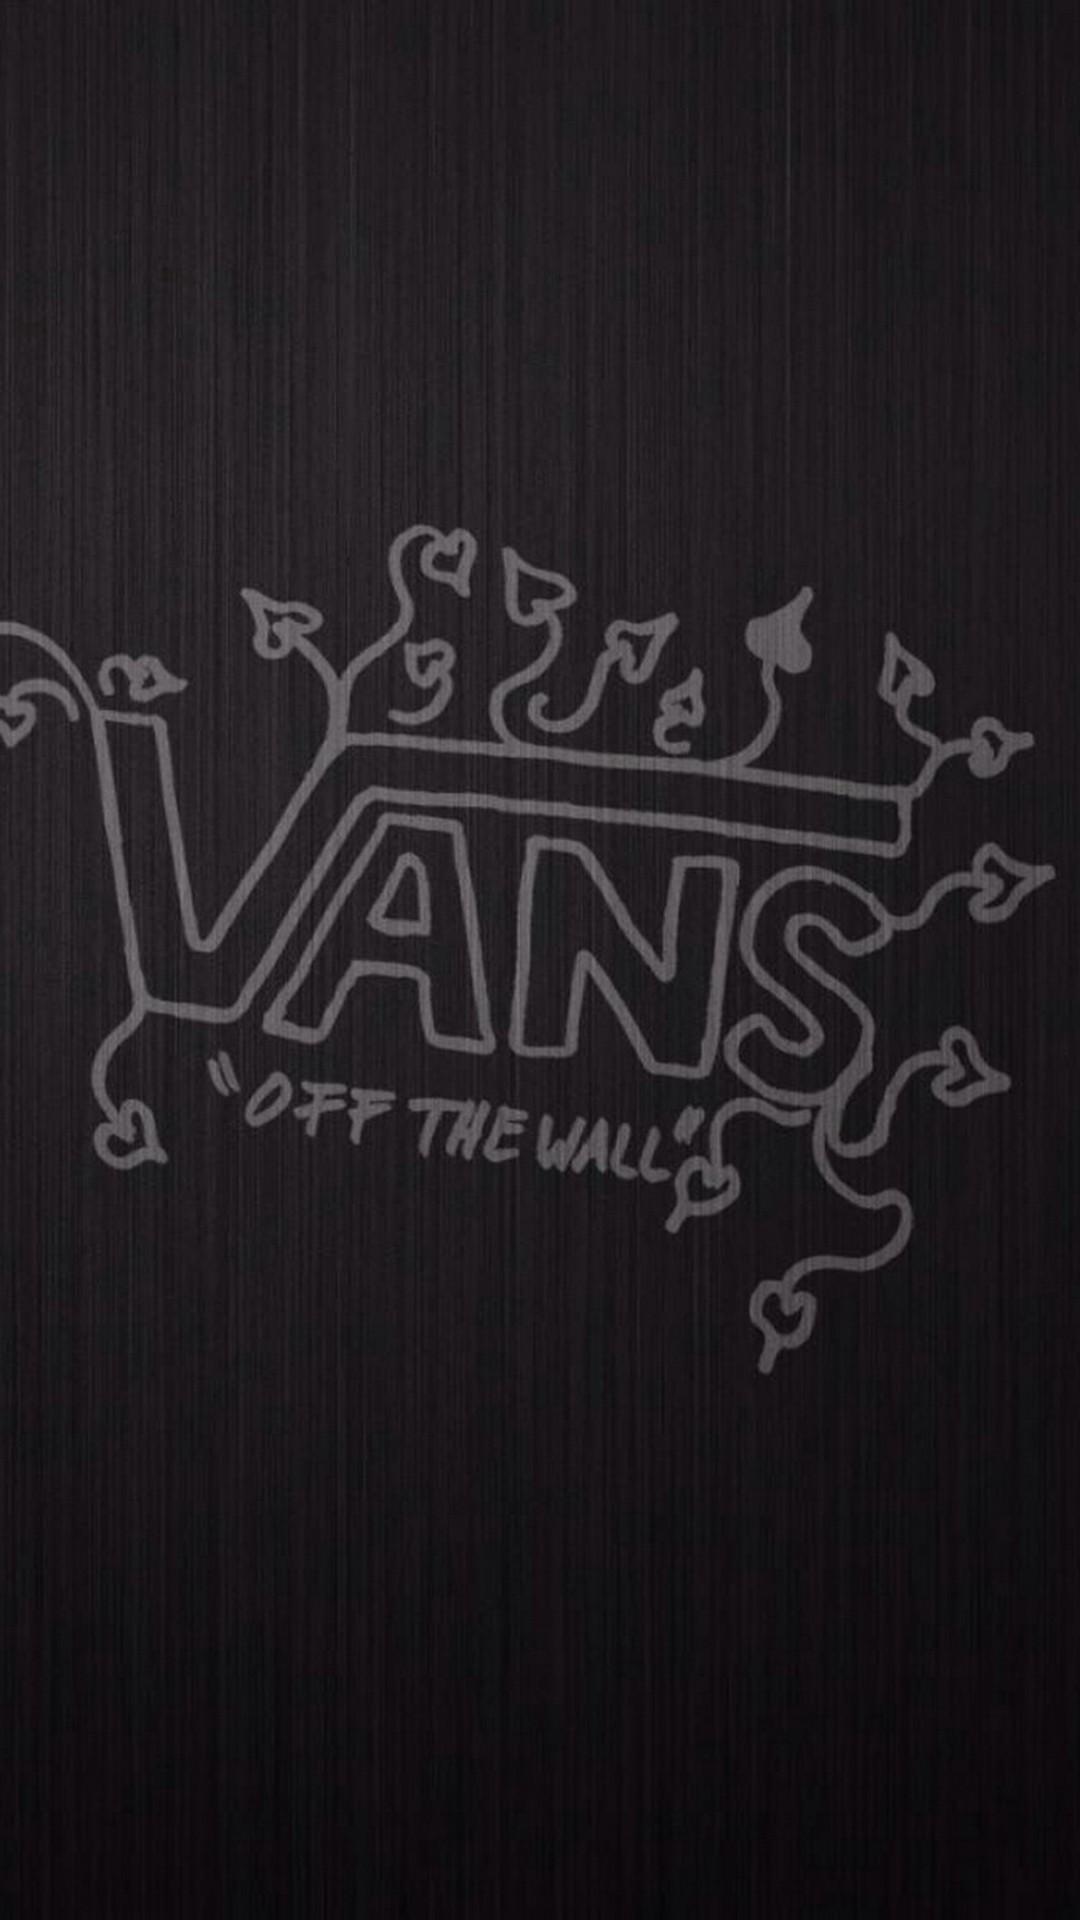 vans off the wall wallpaper 183��